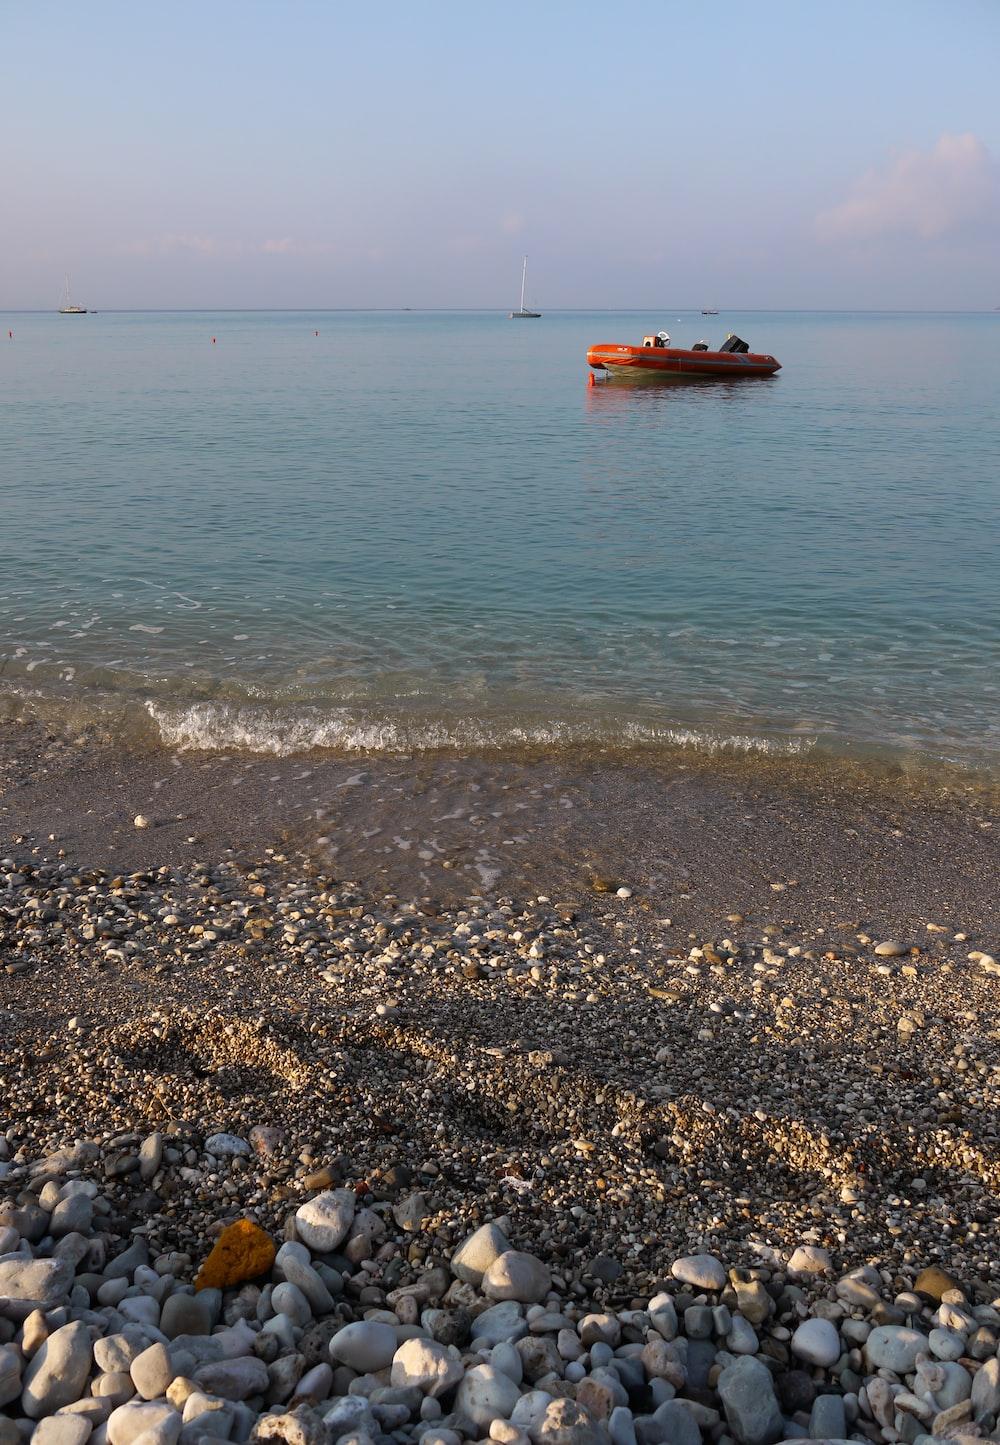 orange raft on body of water